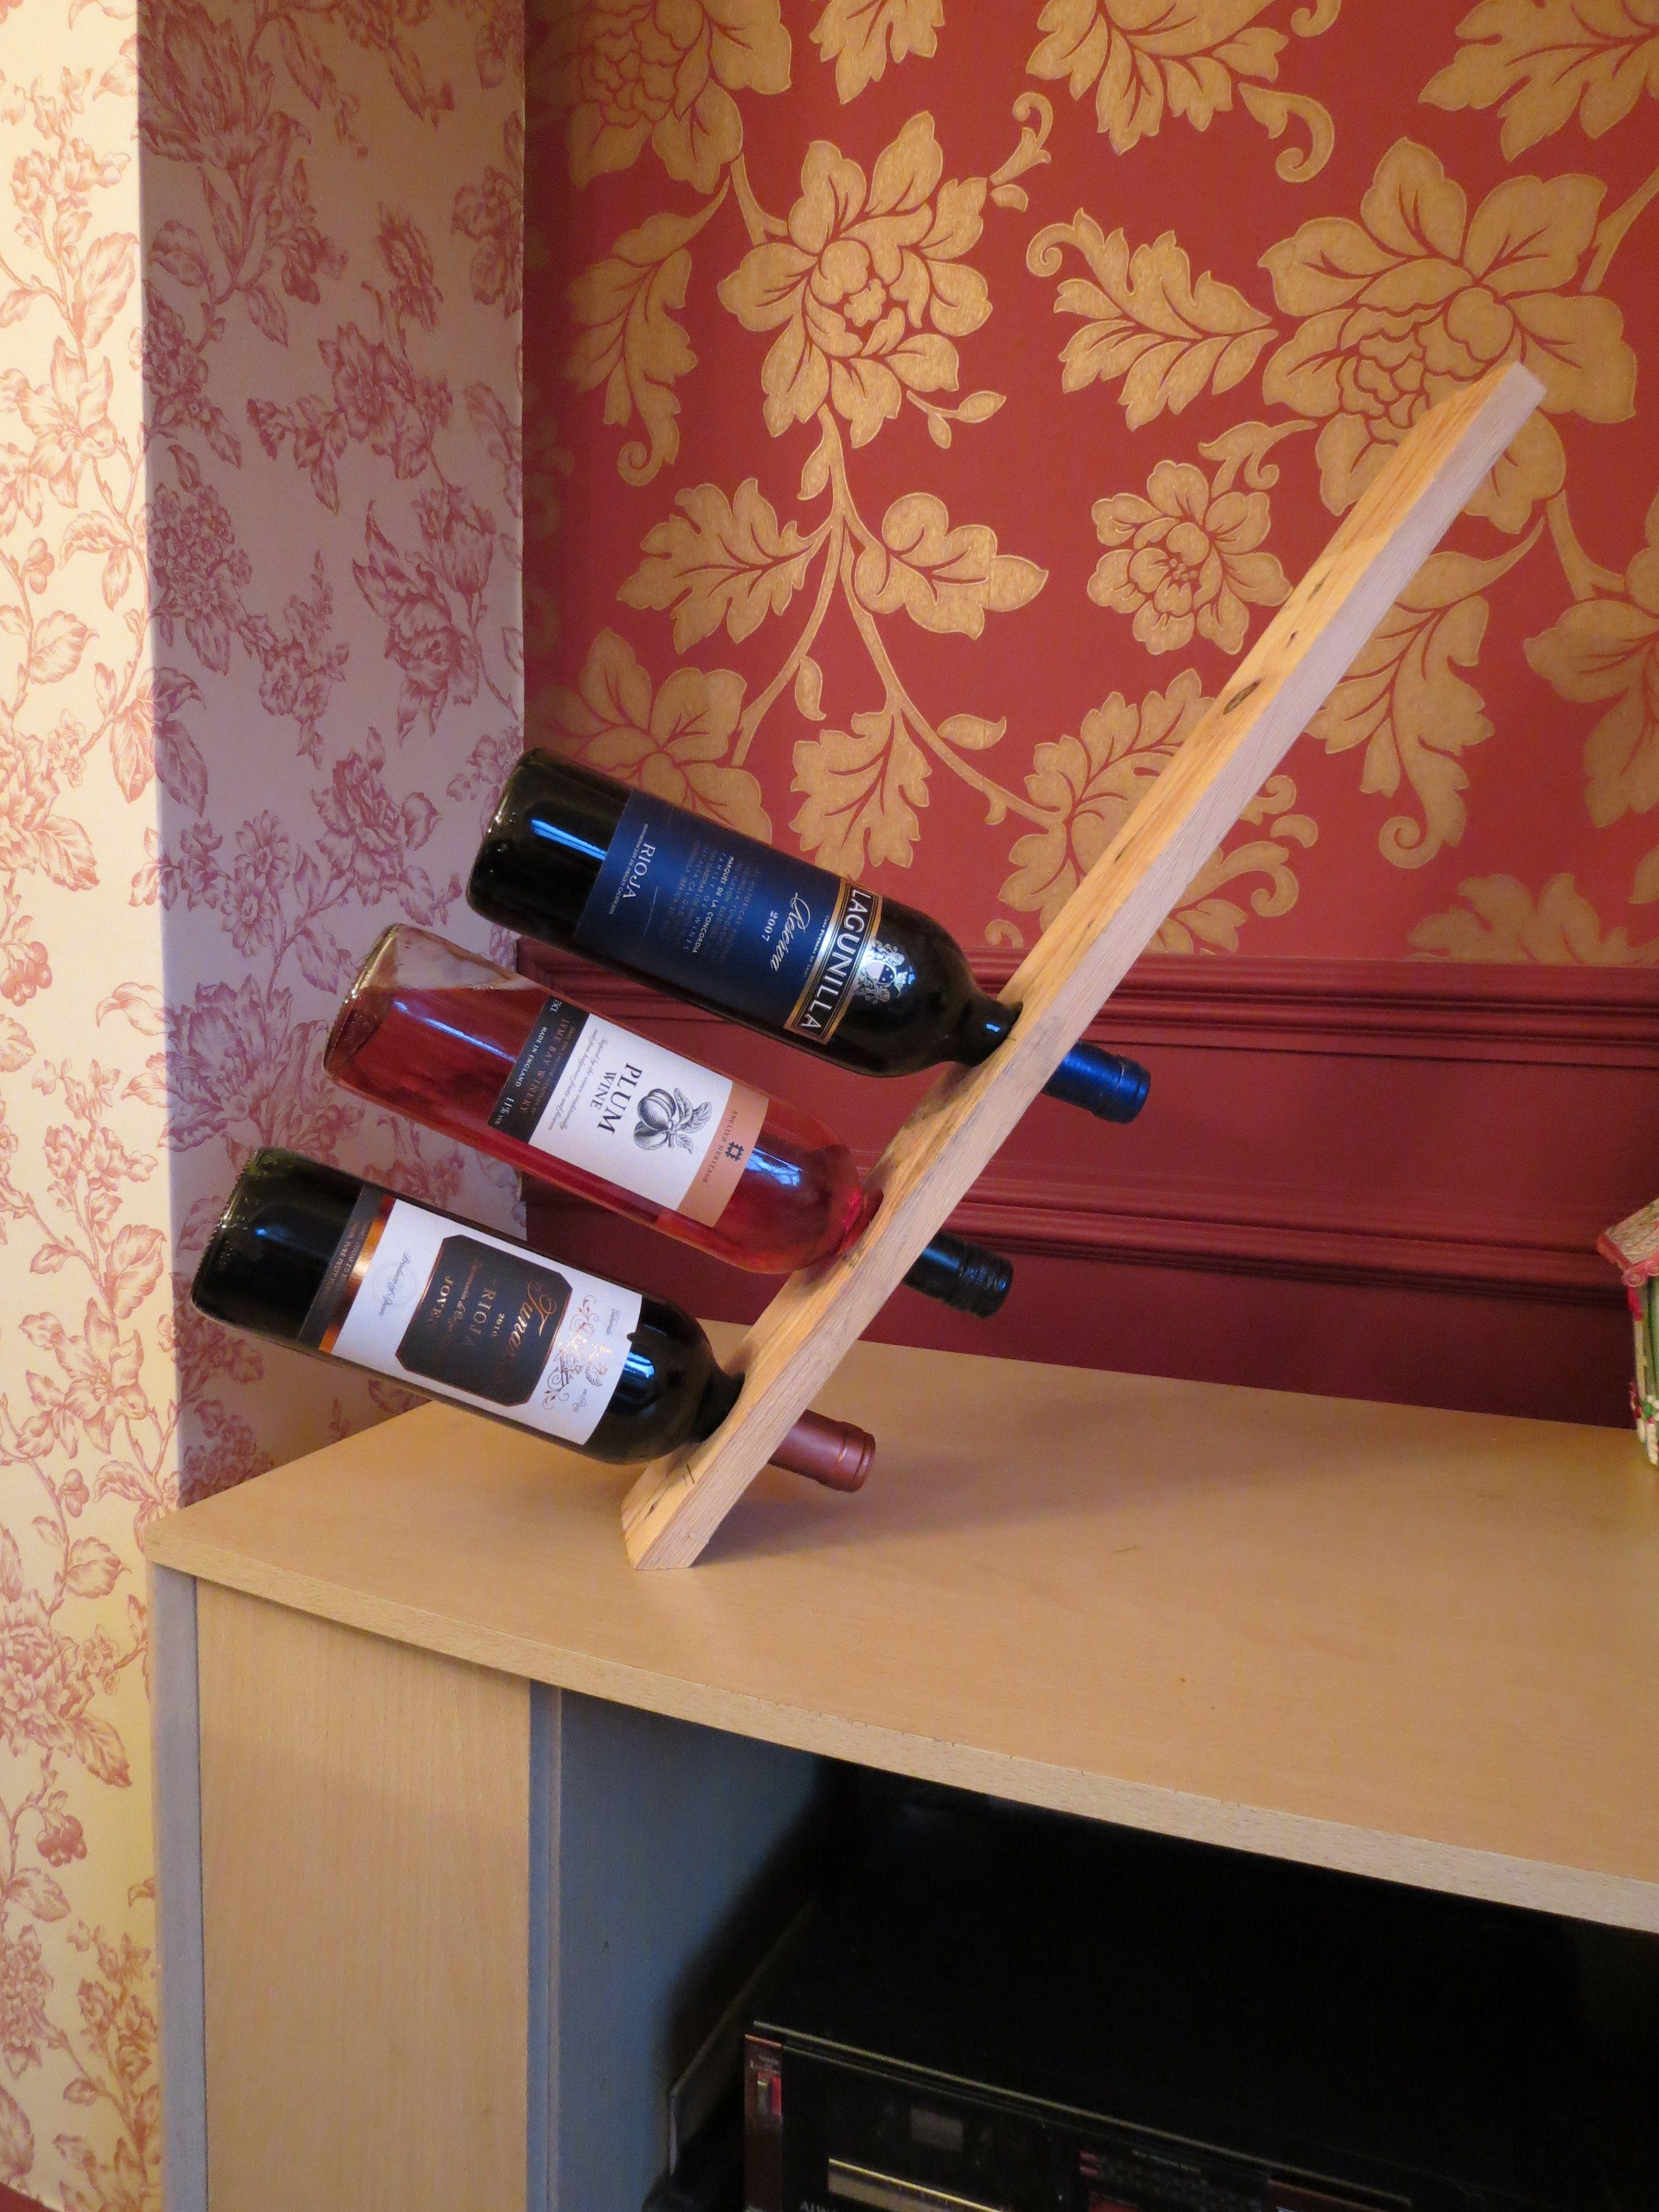 3 Bottle Balancing Wine Rack Wine Rack Wooden Wine Rack Diy Wine Rack